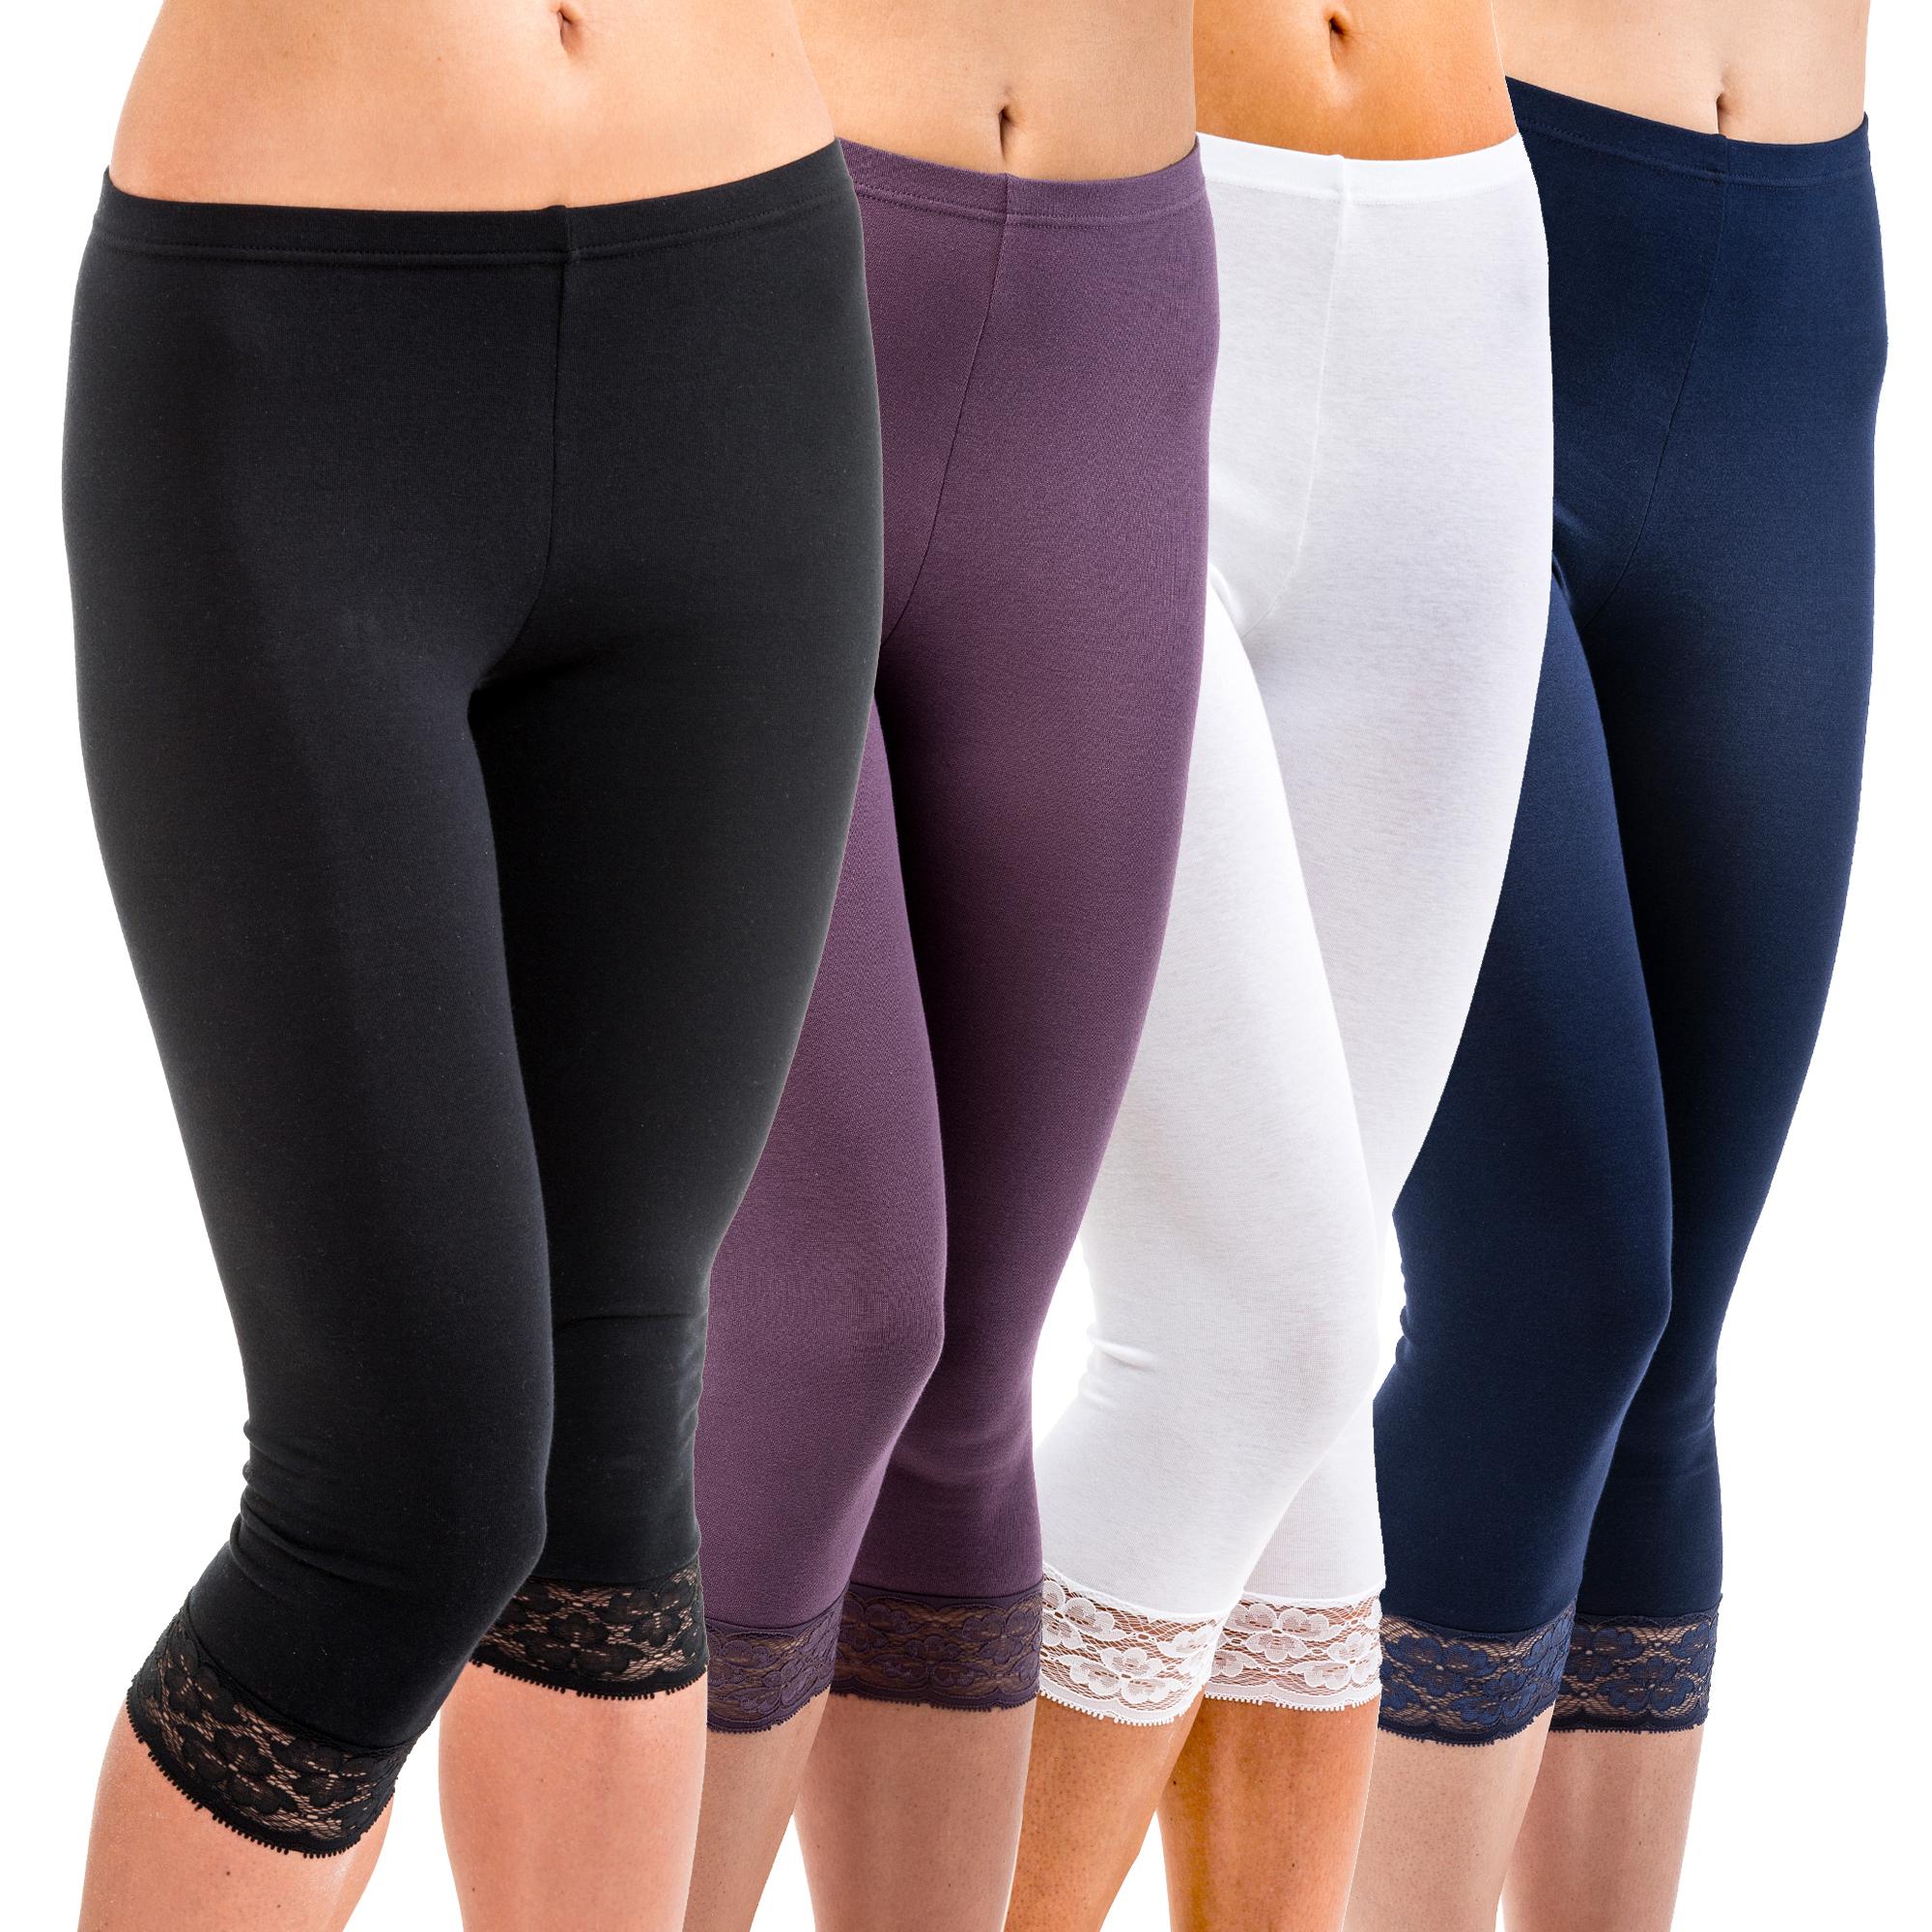 3 4 leggings damen spitze